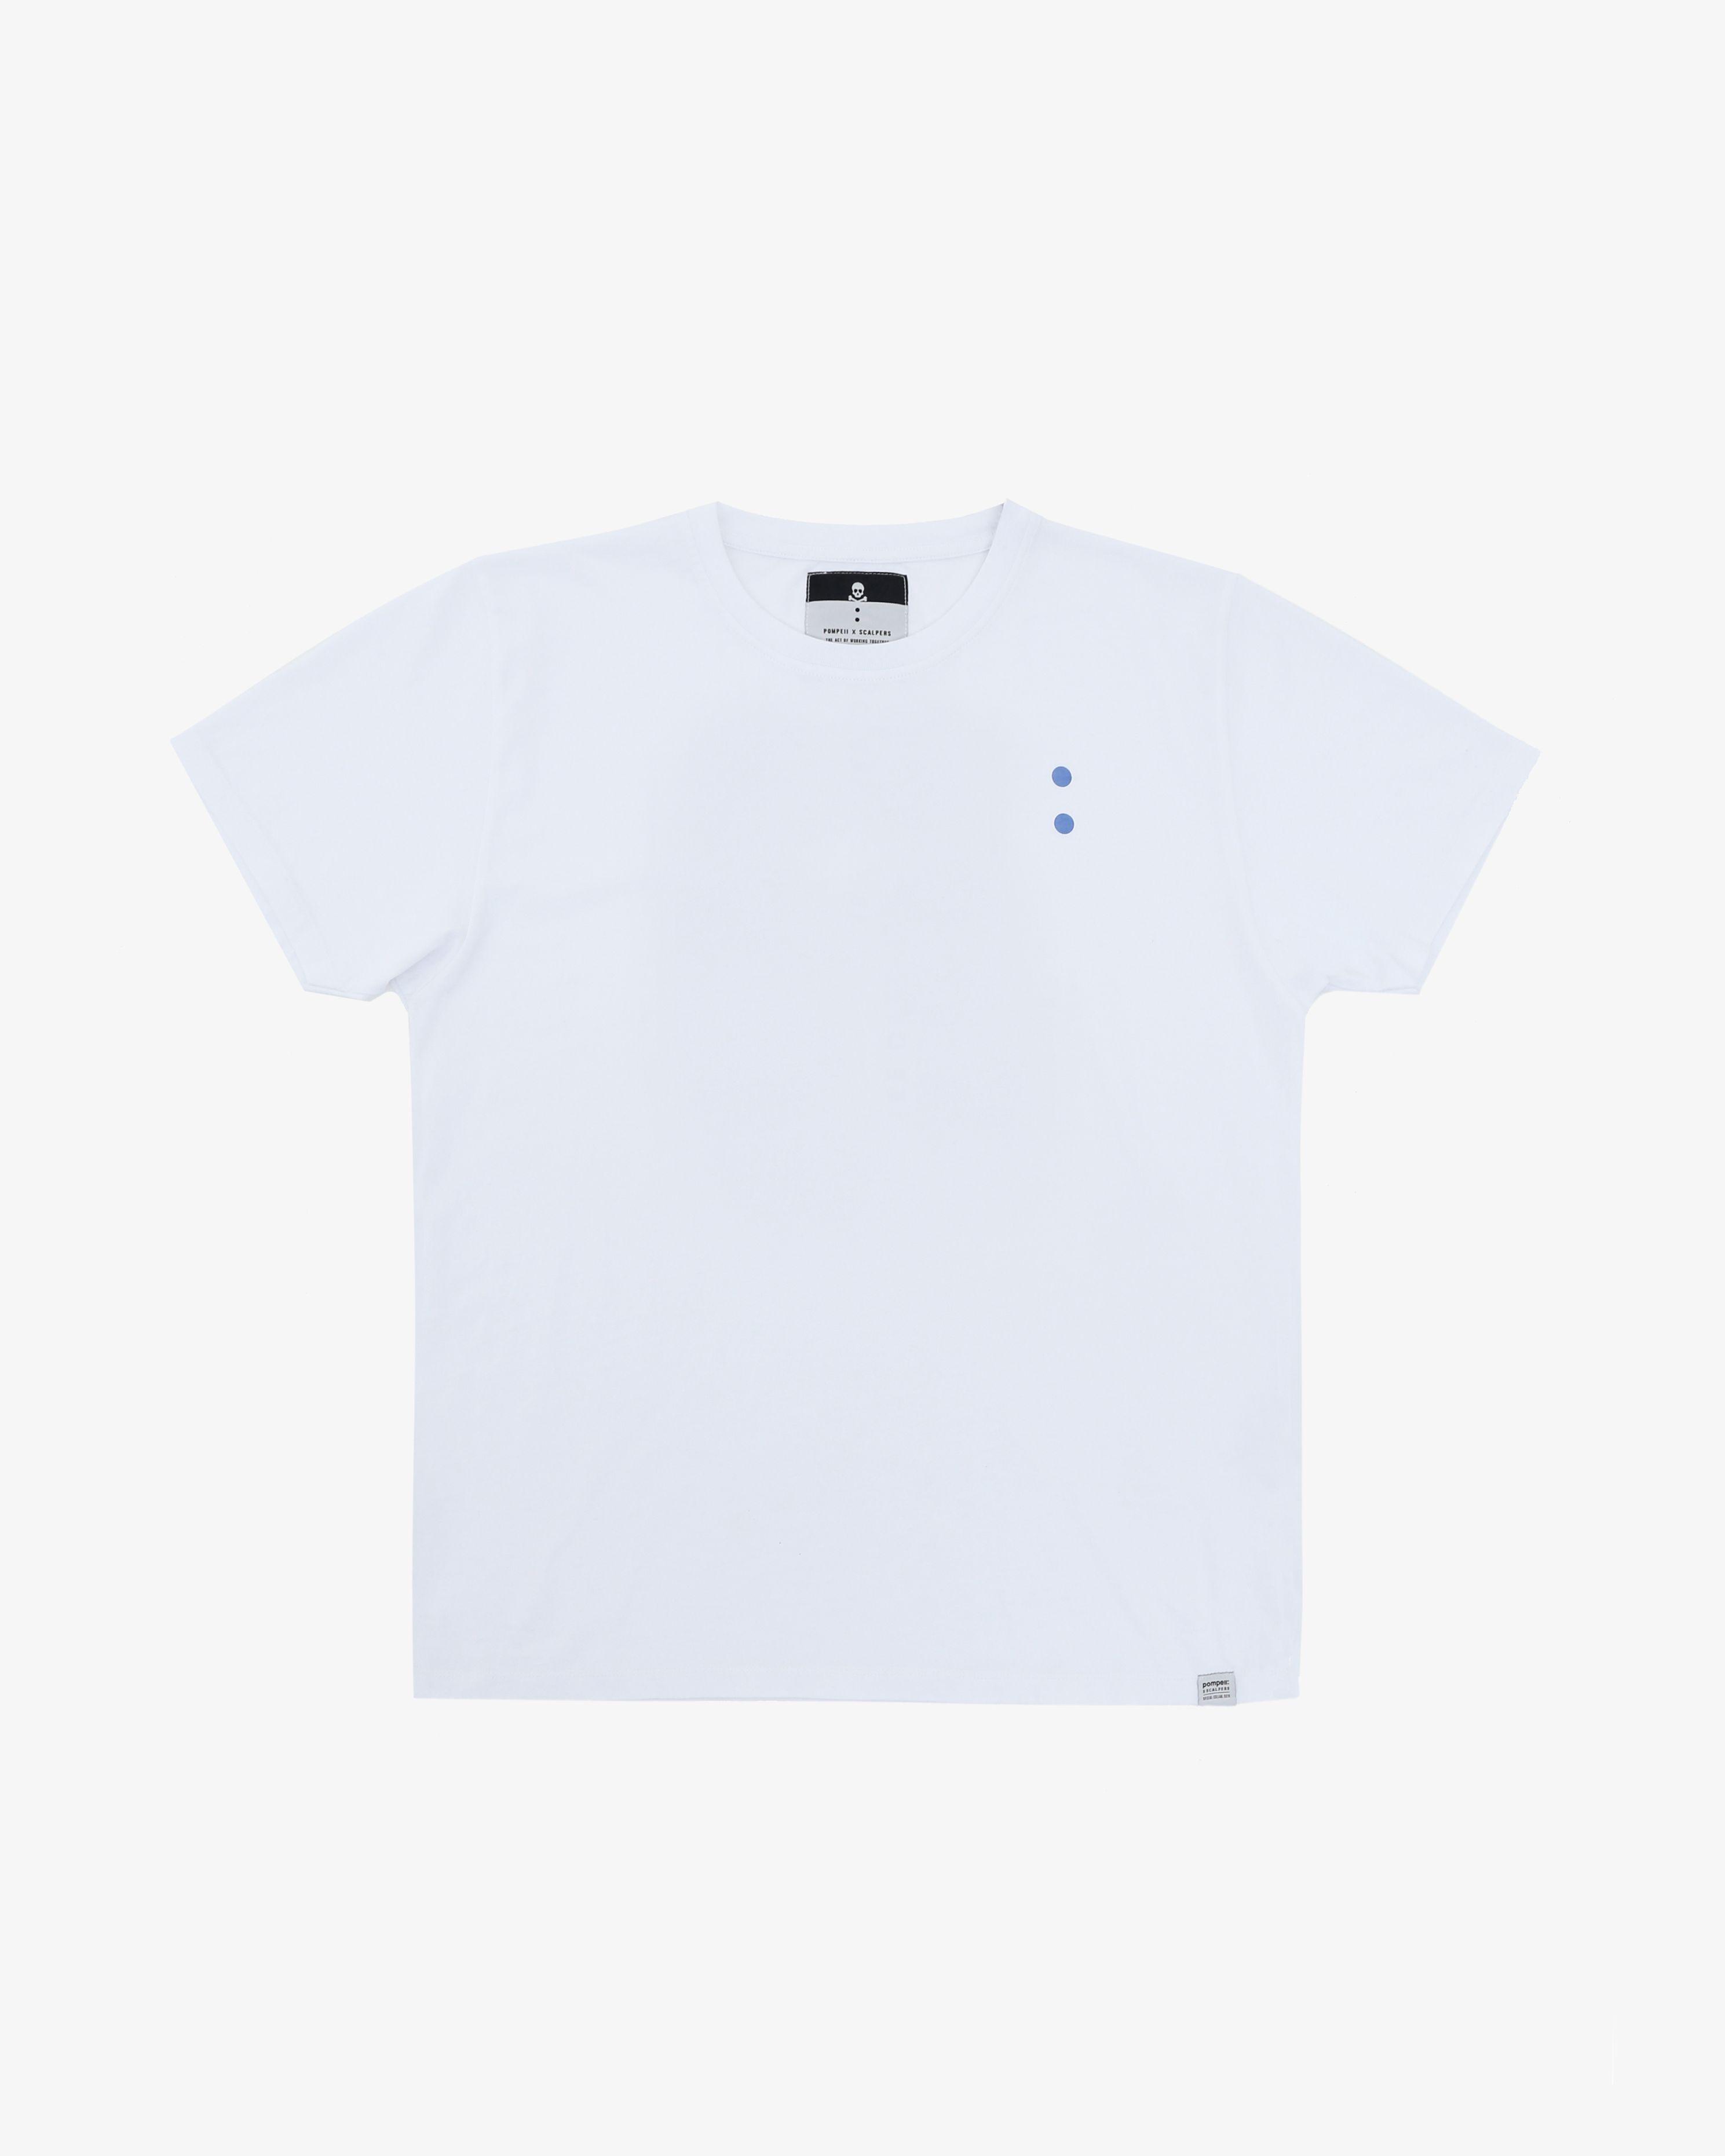 Camiseta Pompeii x Scalpers